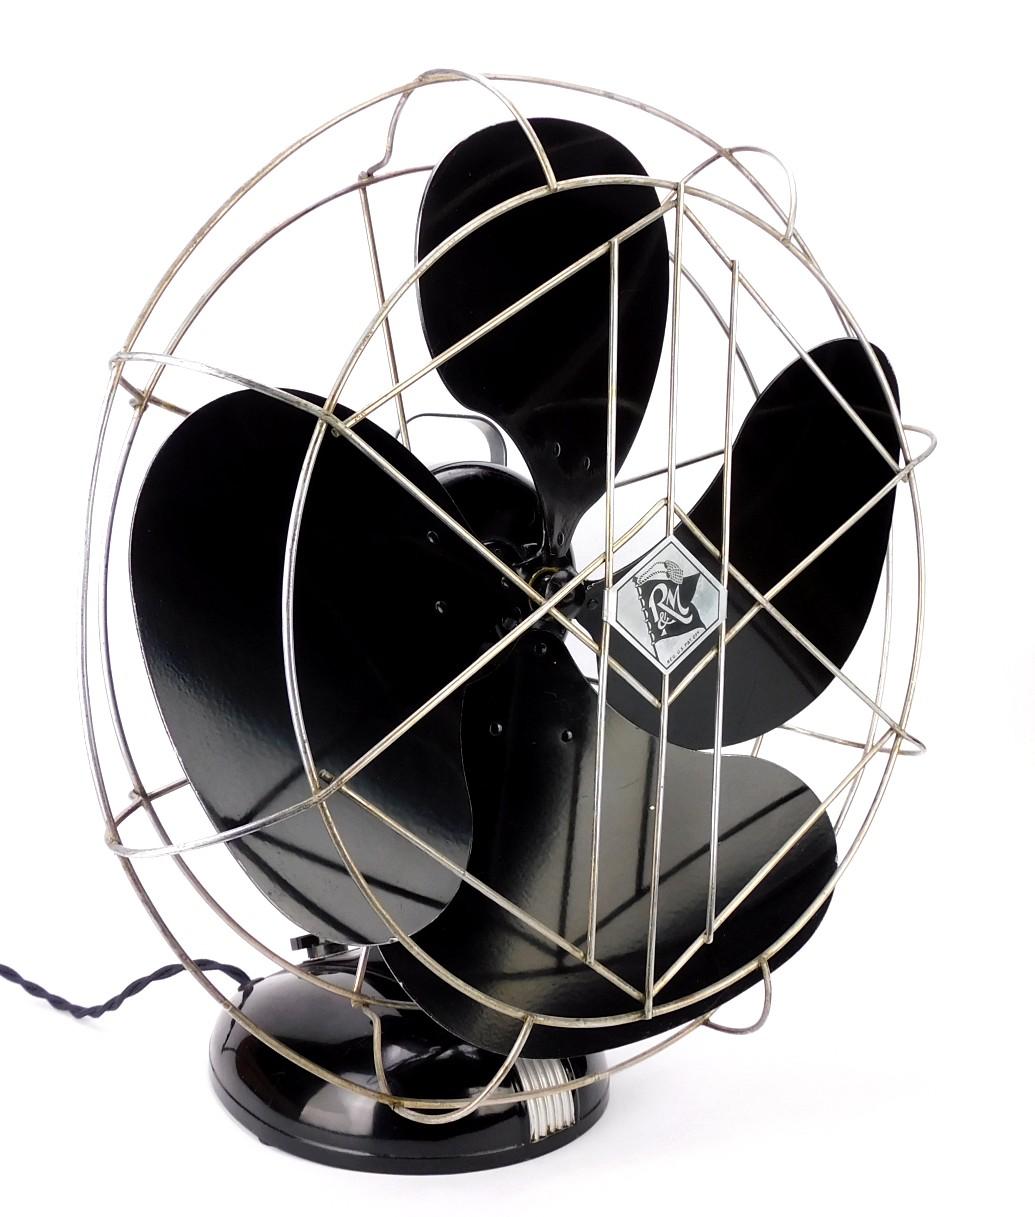 "Circa 1937 16"" Robbins & Myers List No. 1704 Oscillating Desk Fan"